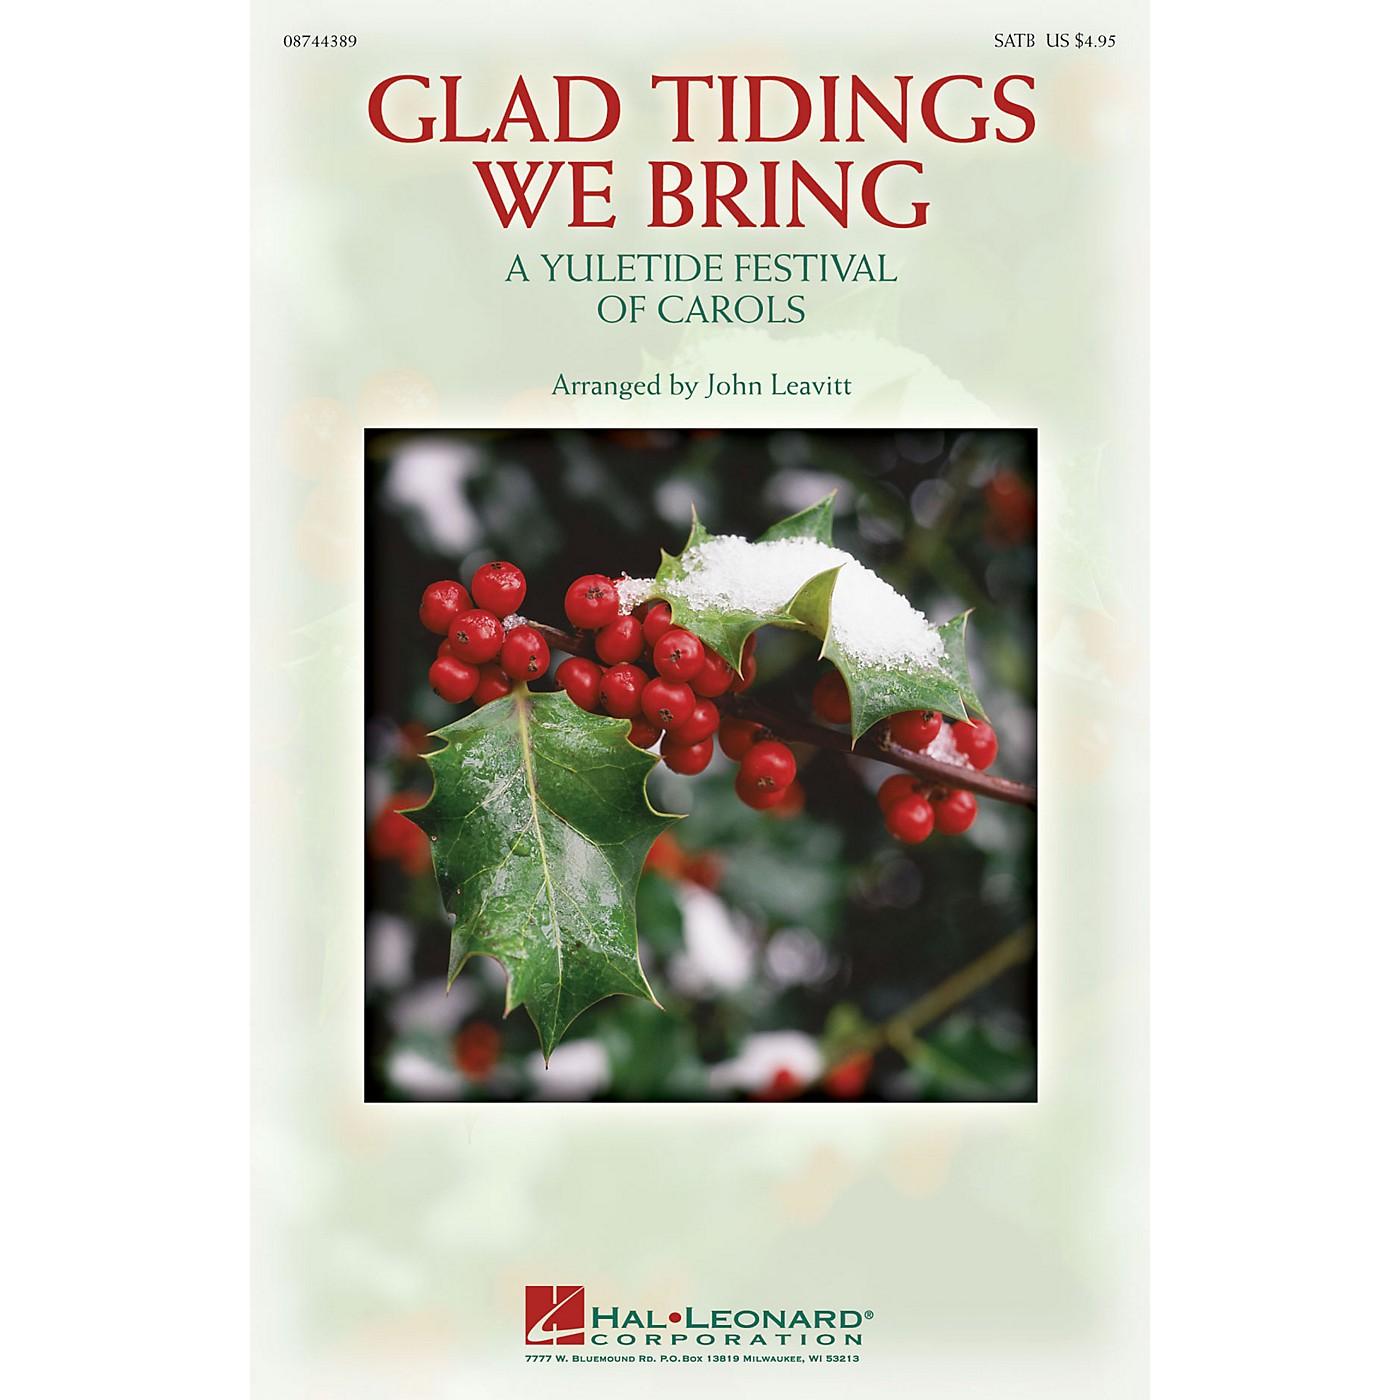 Hal Leonard Glad Tidings We Bring (A Yuletide Festival of Carols) ShowTrax CD Arranged by John Leavitt thumbnail